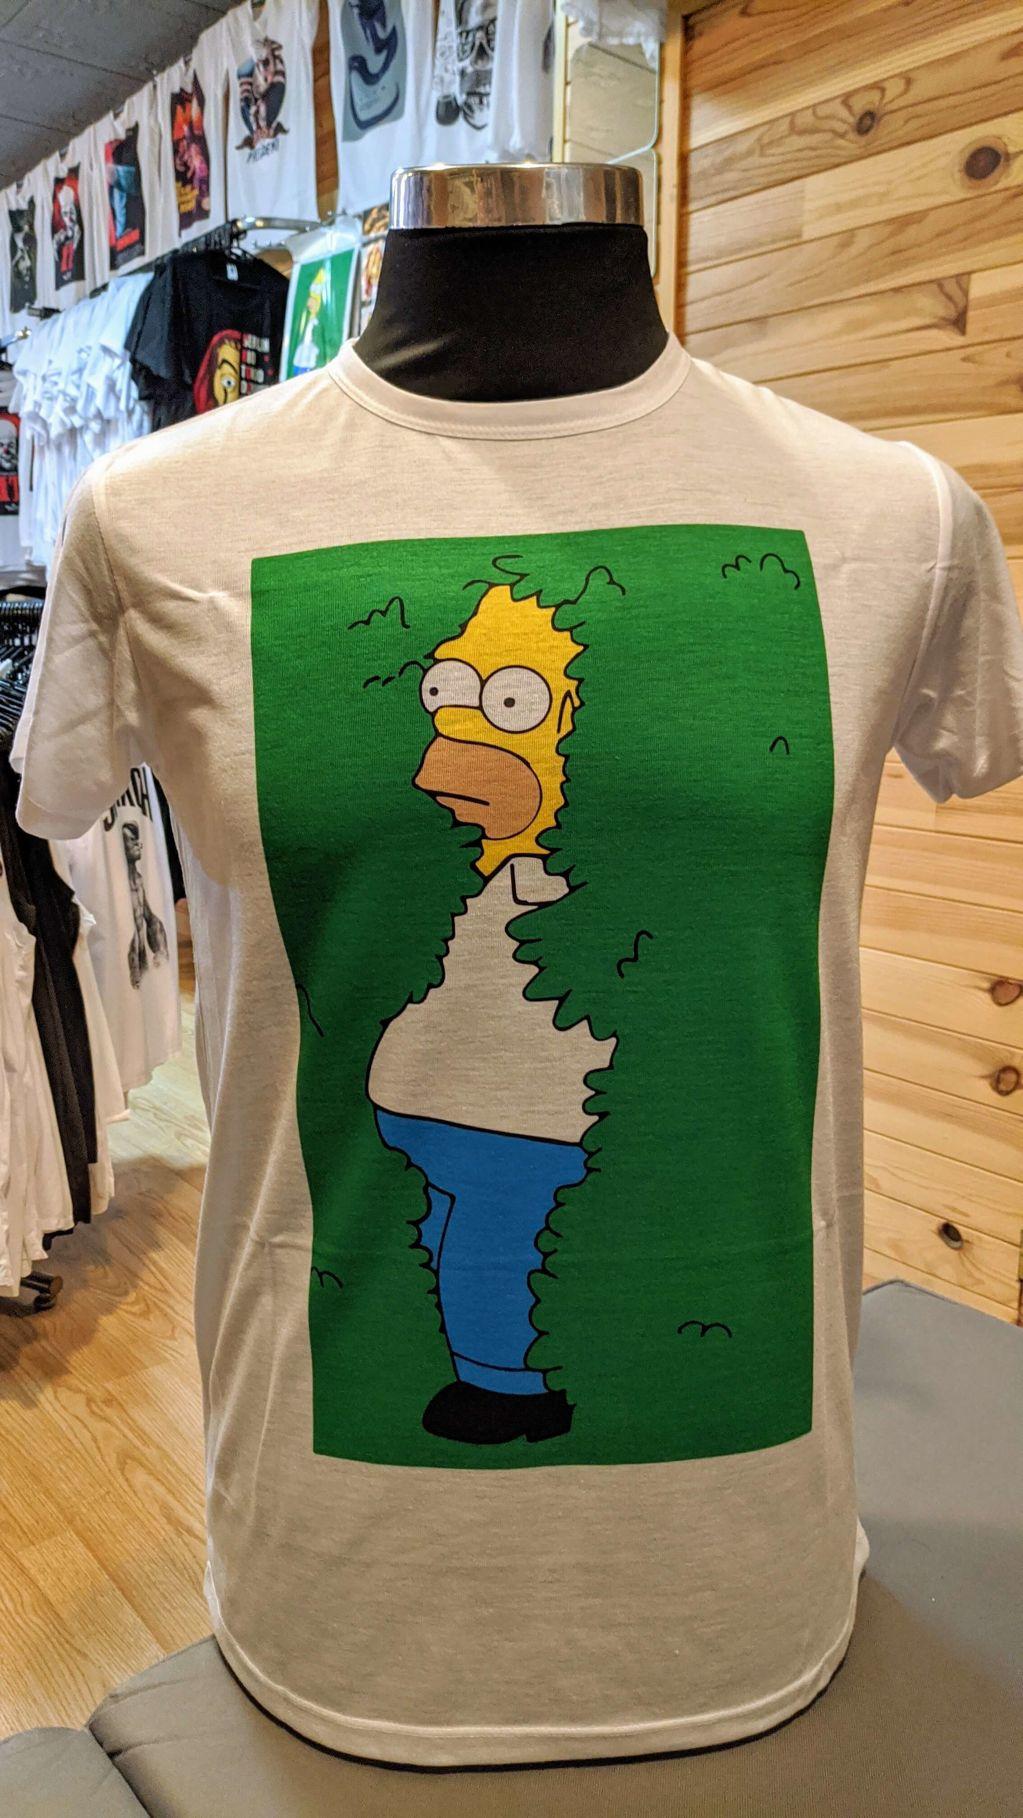 Homer Simpson - 47e14-camiseta-homer-simpson-seto-1.jpg